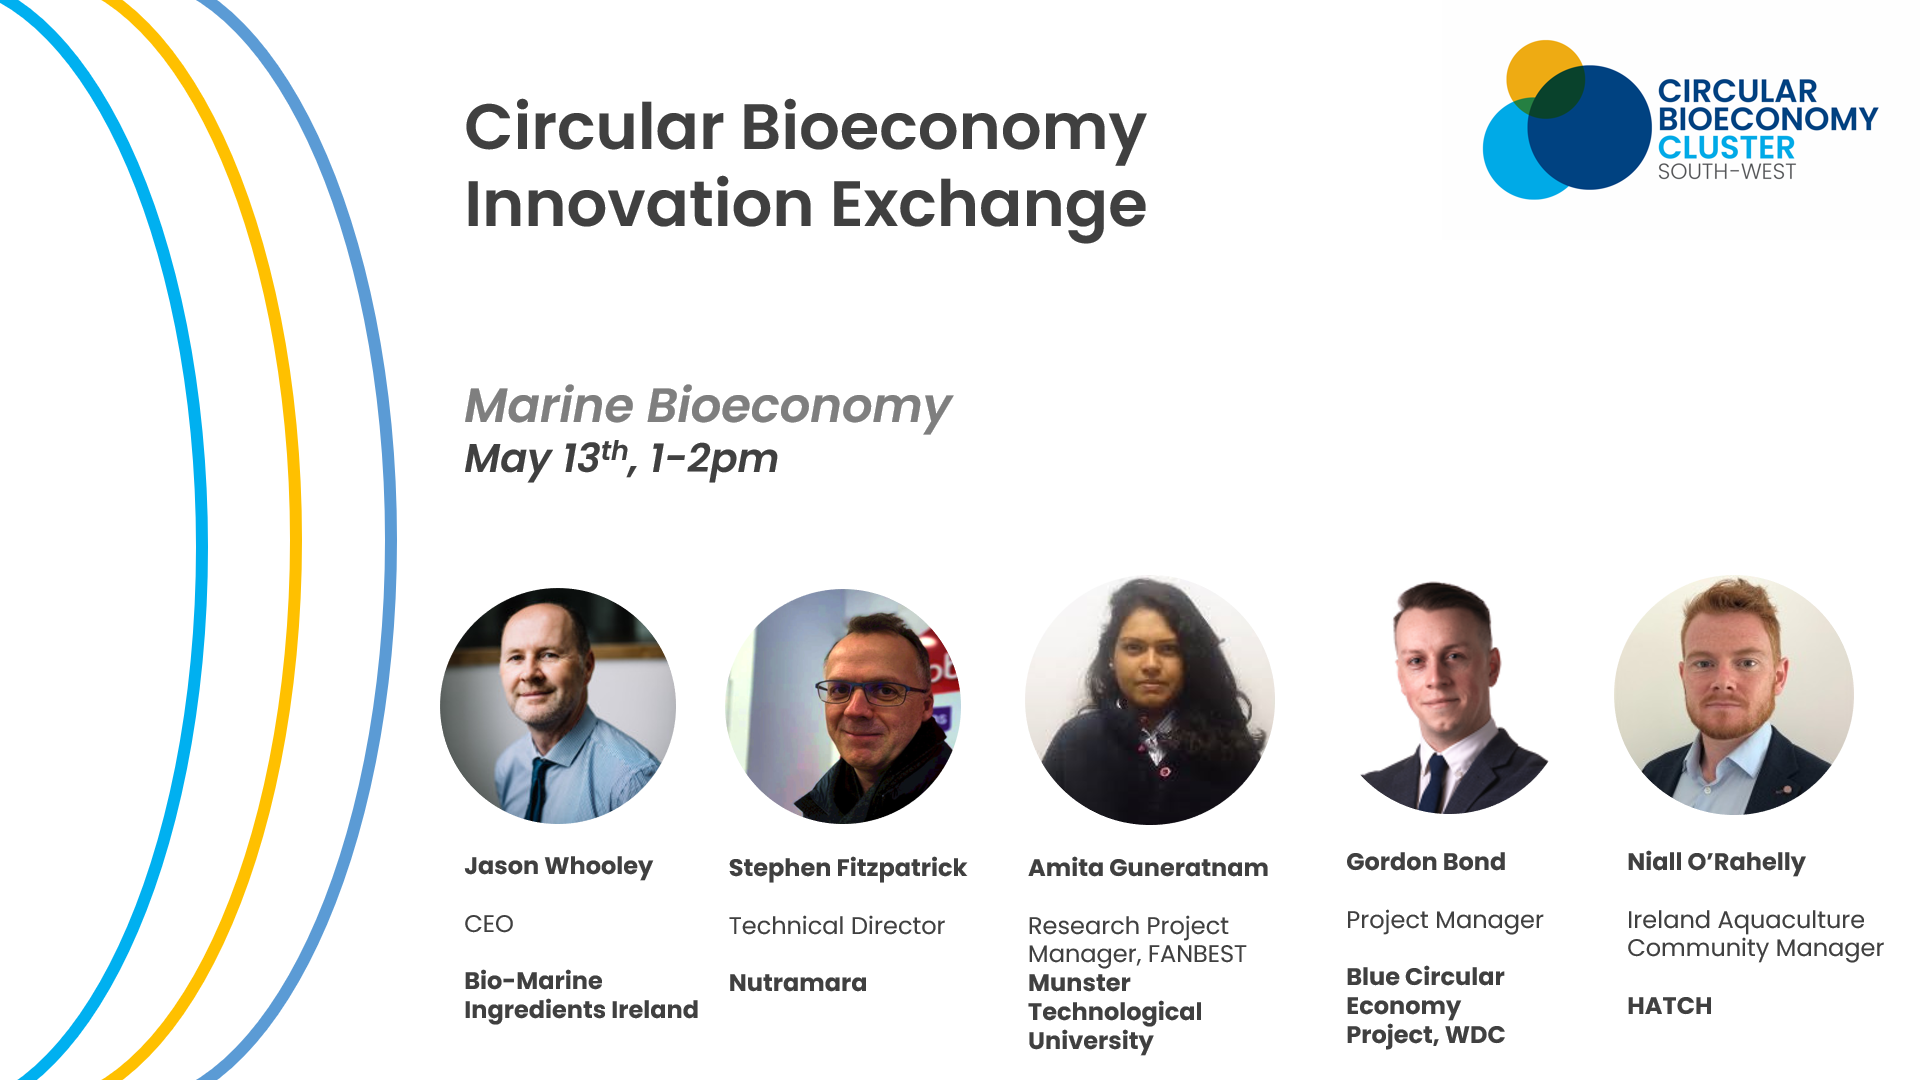 Innovation Exchange: Marine Bioeconomy